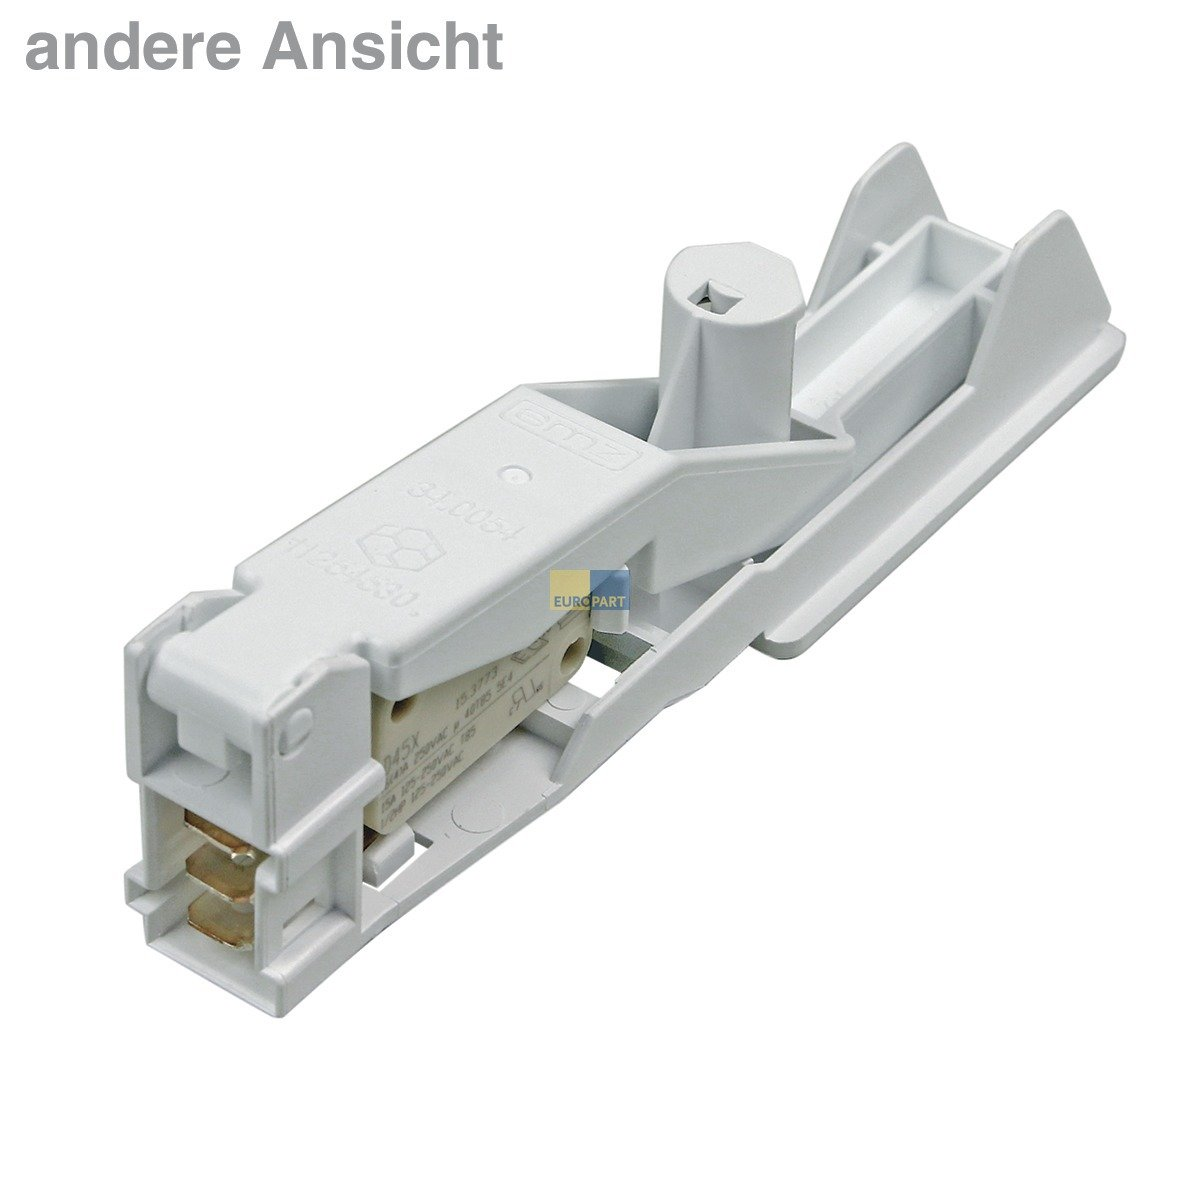 ORIGINAL Electrolux AEG 112545300 1125453009 T/ürschalter Verriegelungsrelais Schloss T/ürschloss Verriegelung T/ürverriegelung Verschluss W/äschetrockner Trockner Trocknerautomat